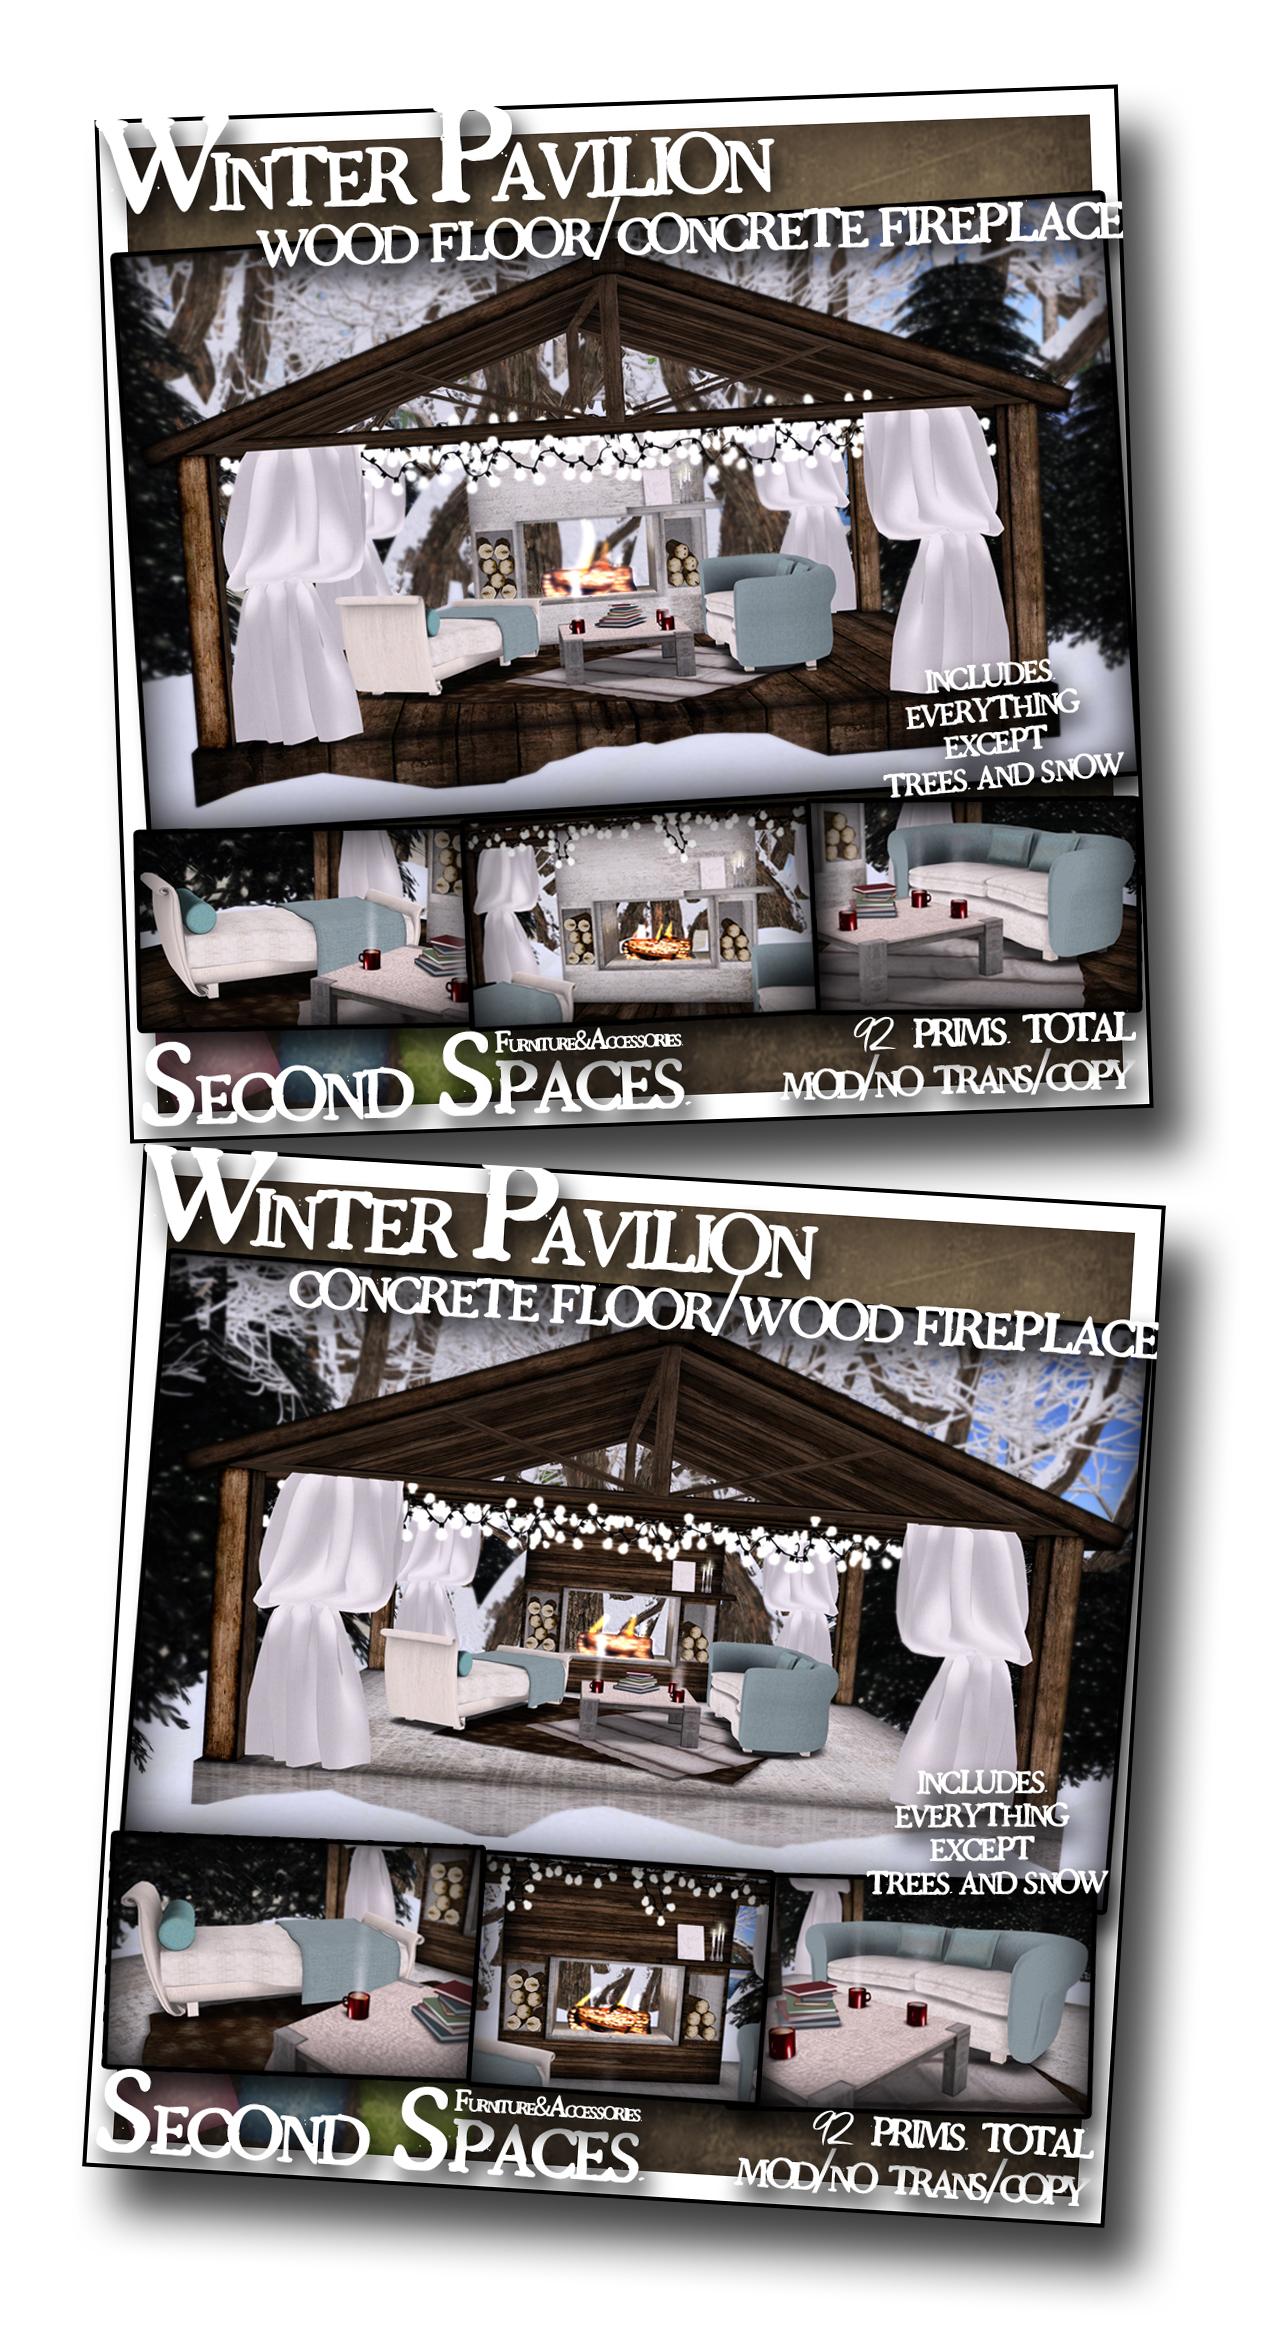 combo winter pavilion